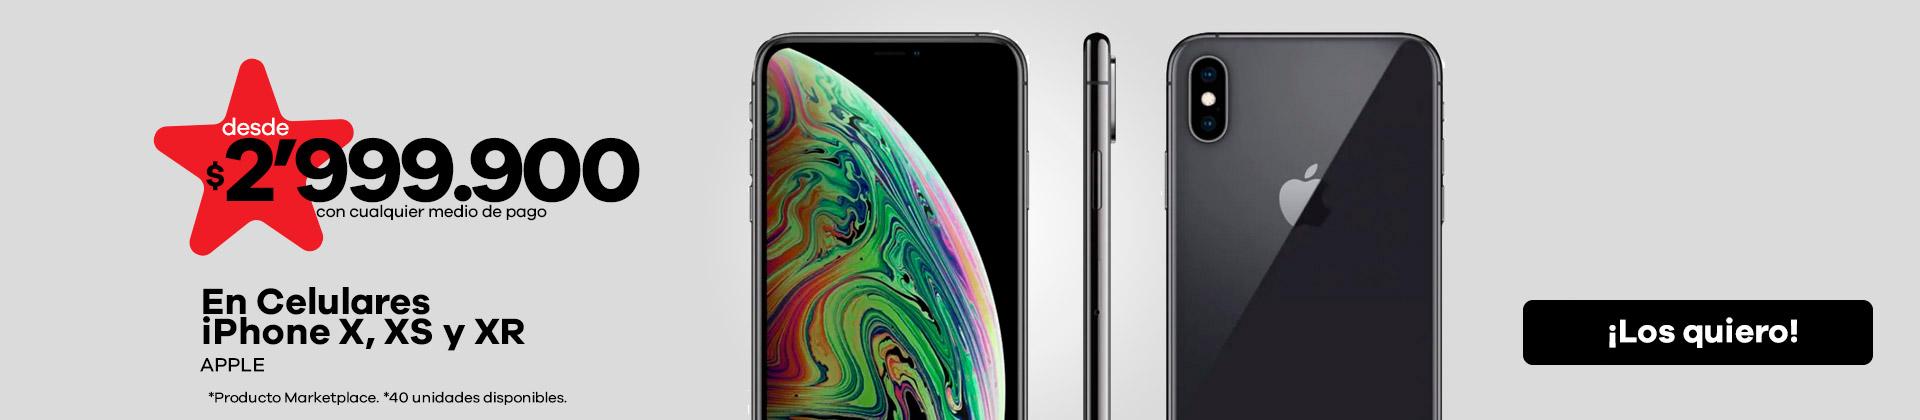 Celulares-iPhone-X-XS-XR